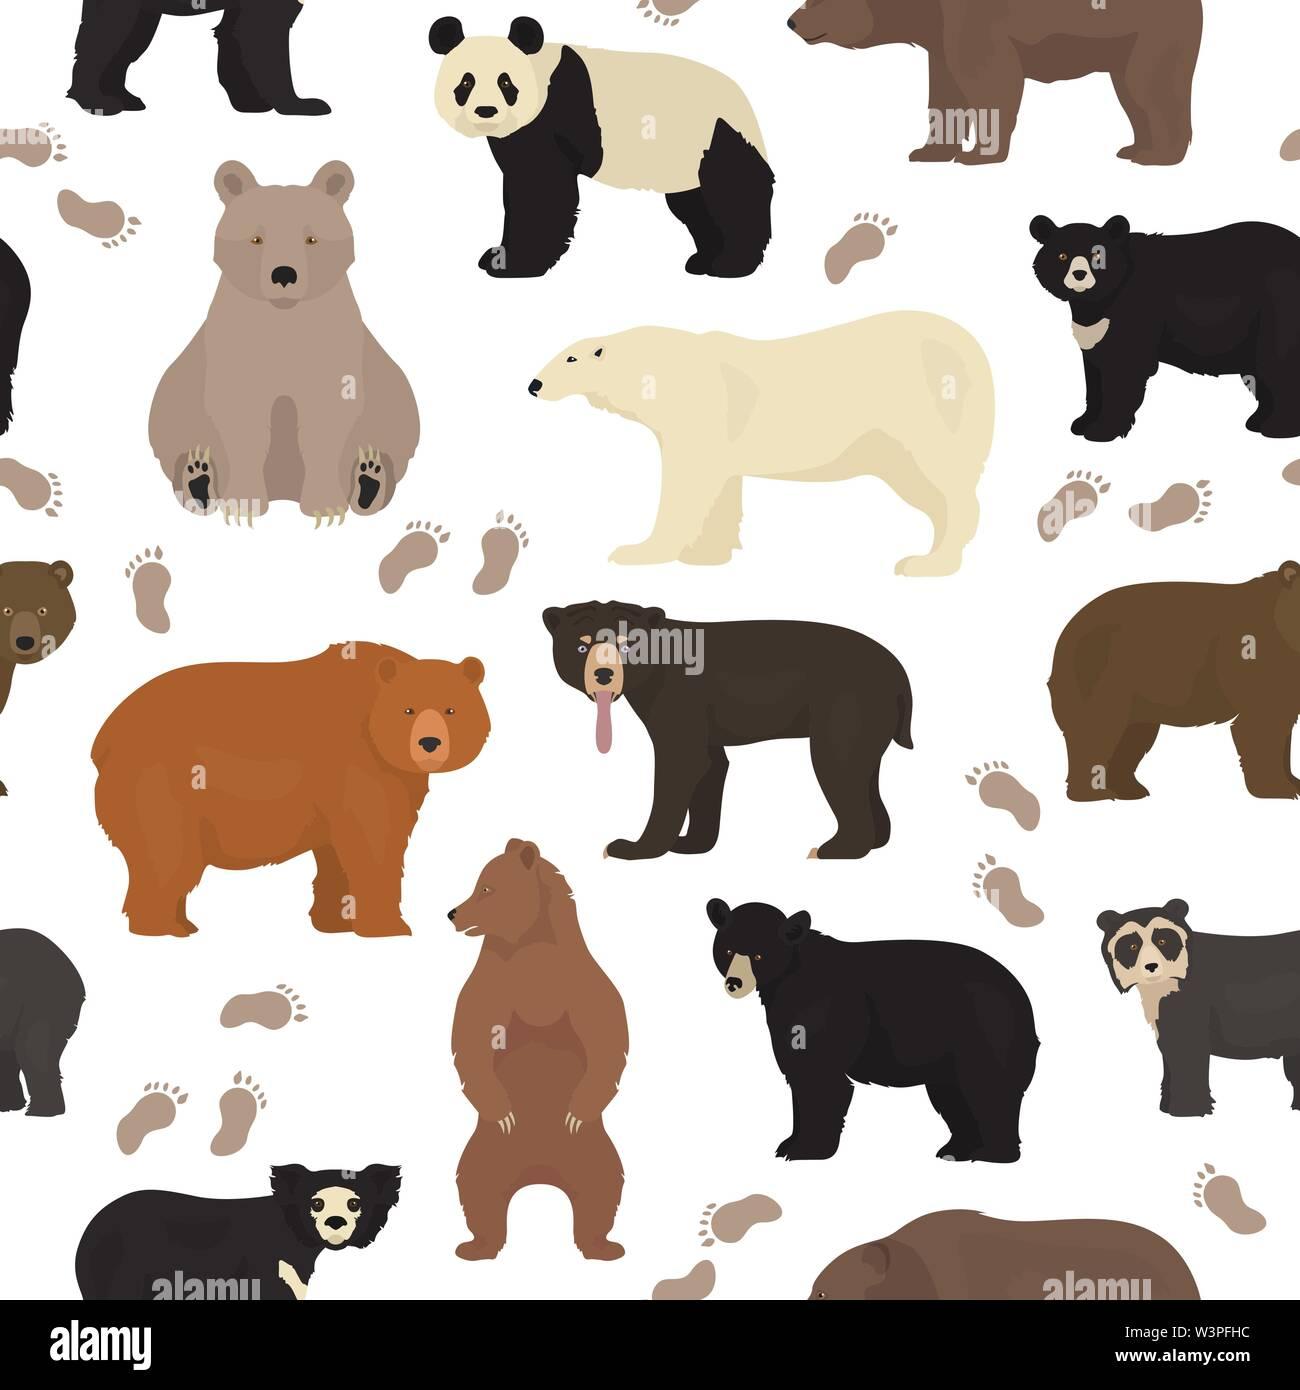 All world bear species in one set. Bears seamless pattern. Vector illustration Stock Vector